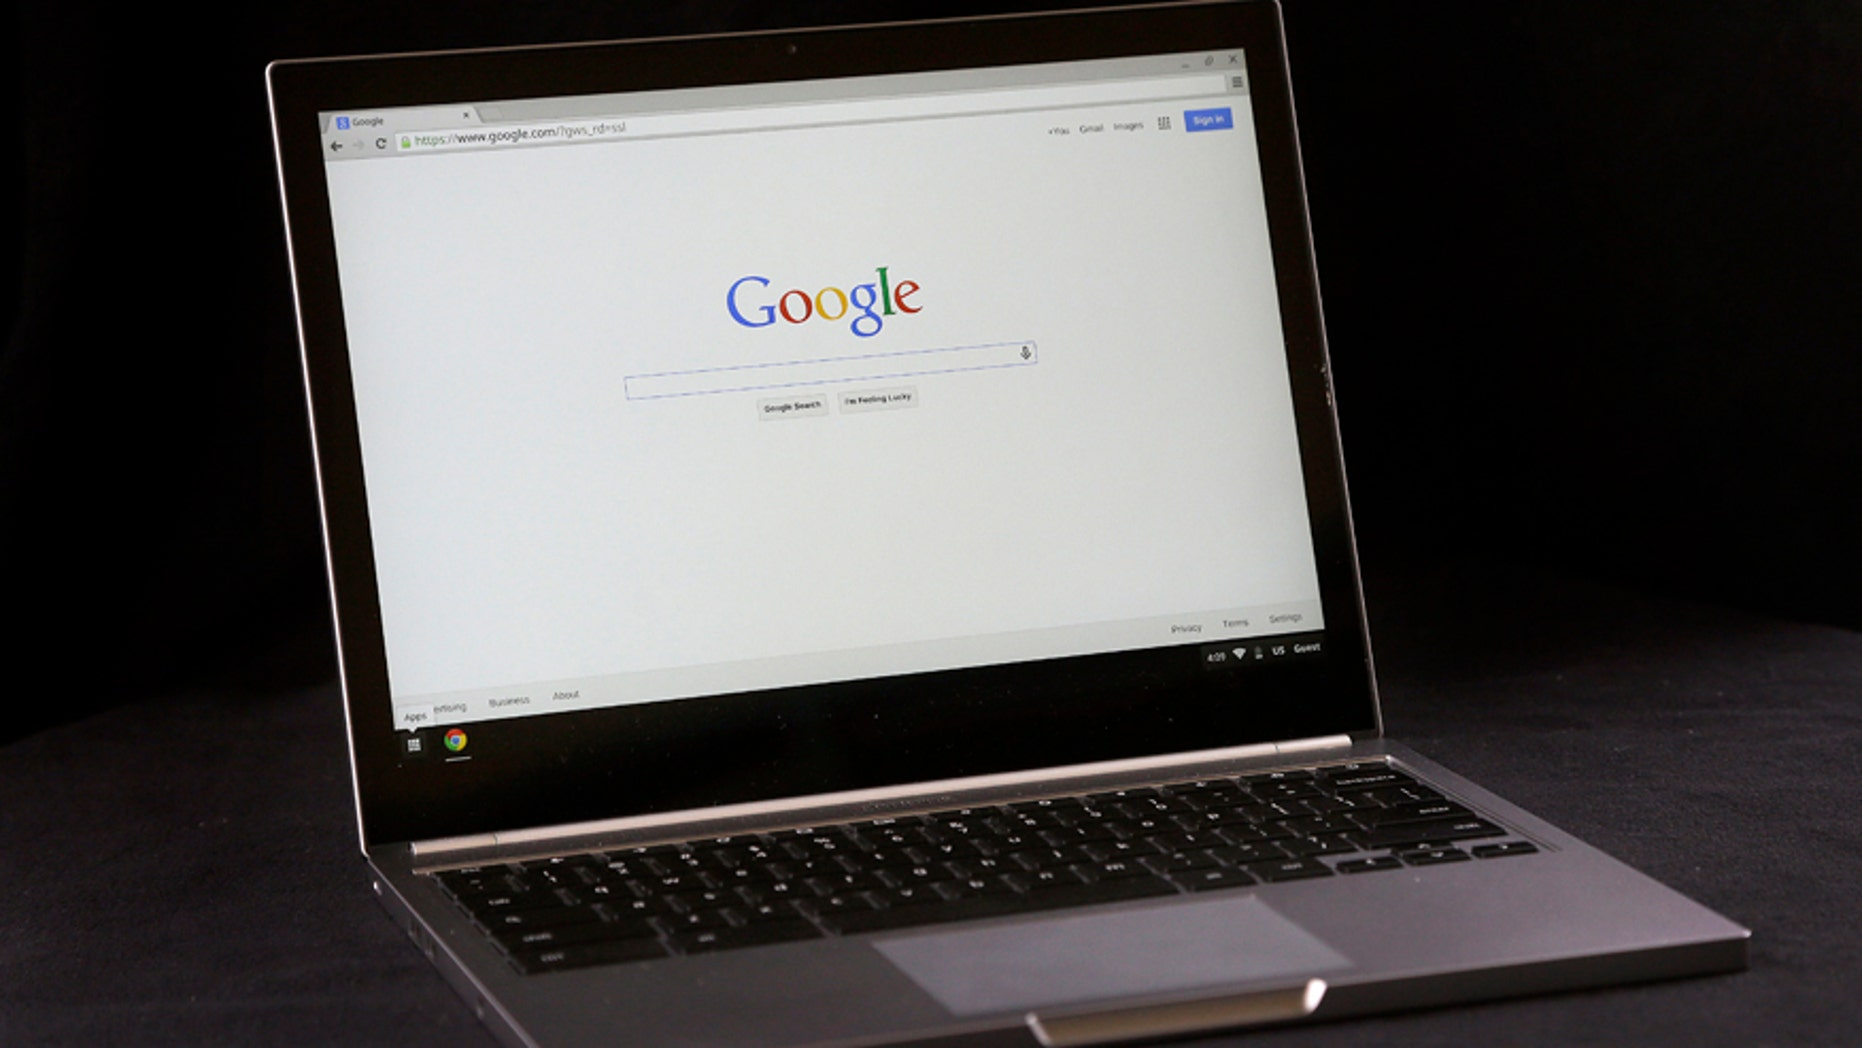 Google plans to kill Chrome OS, fold it into Android | Fox News